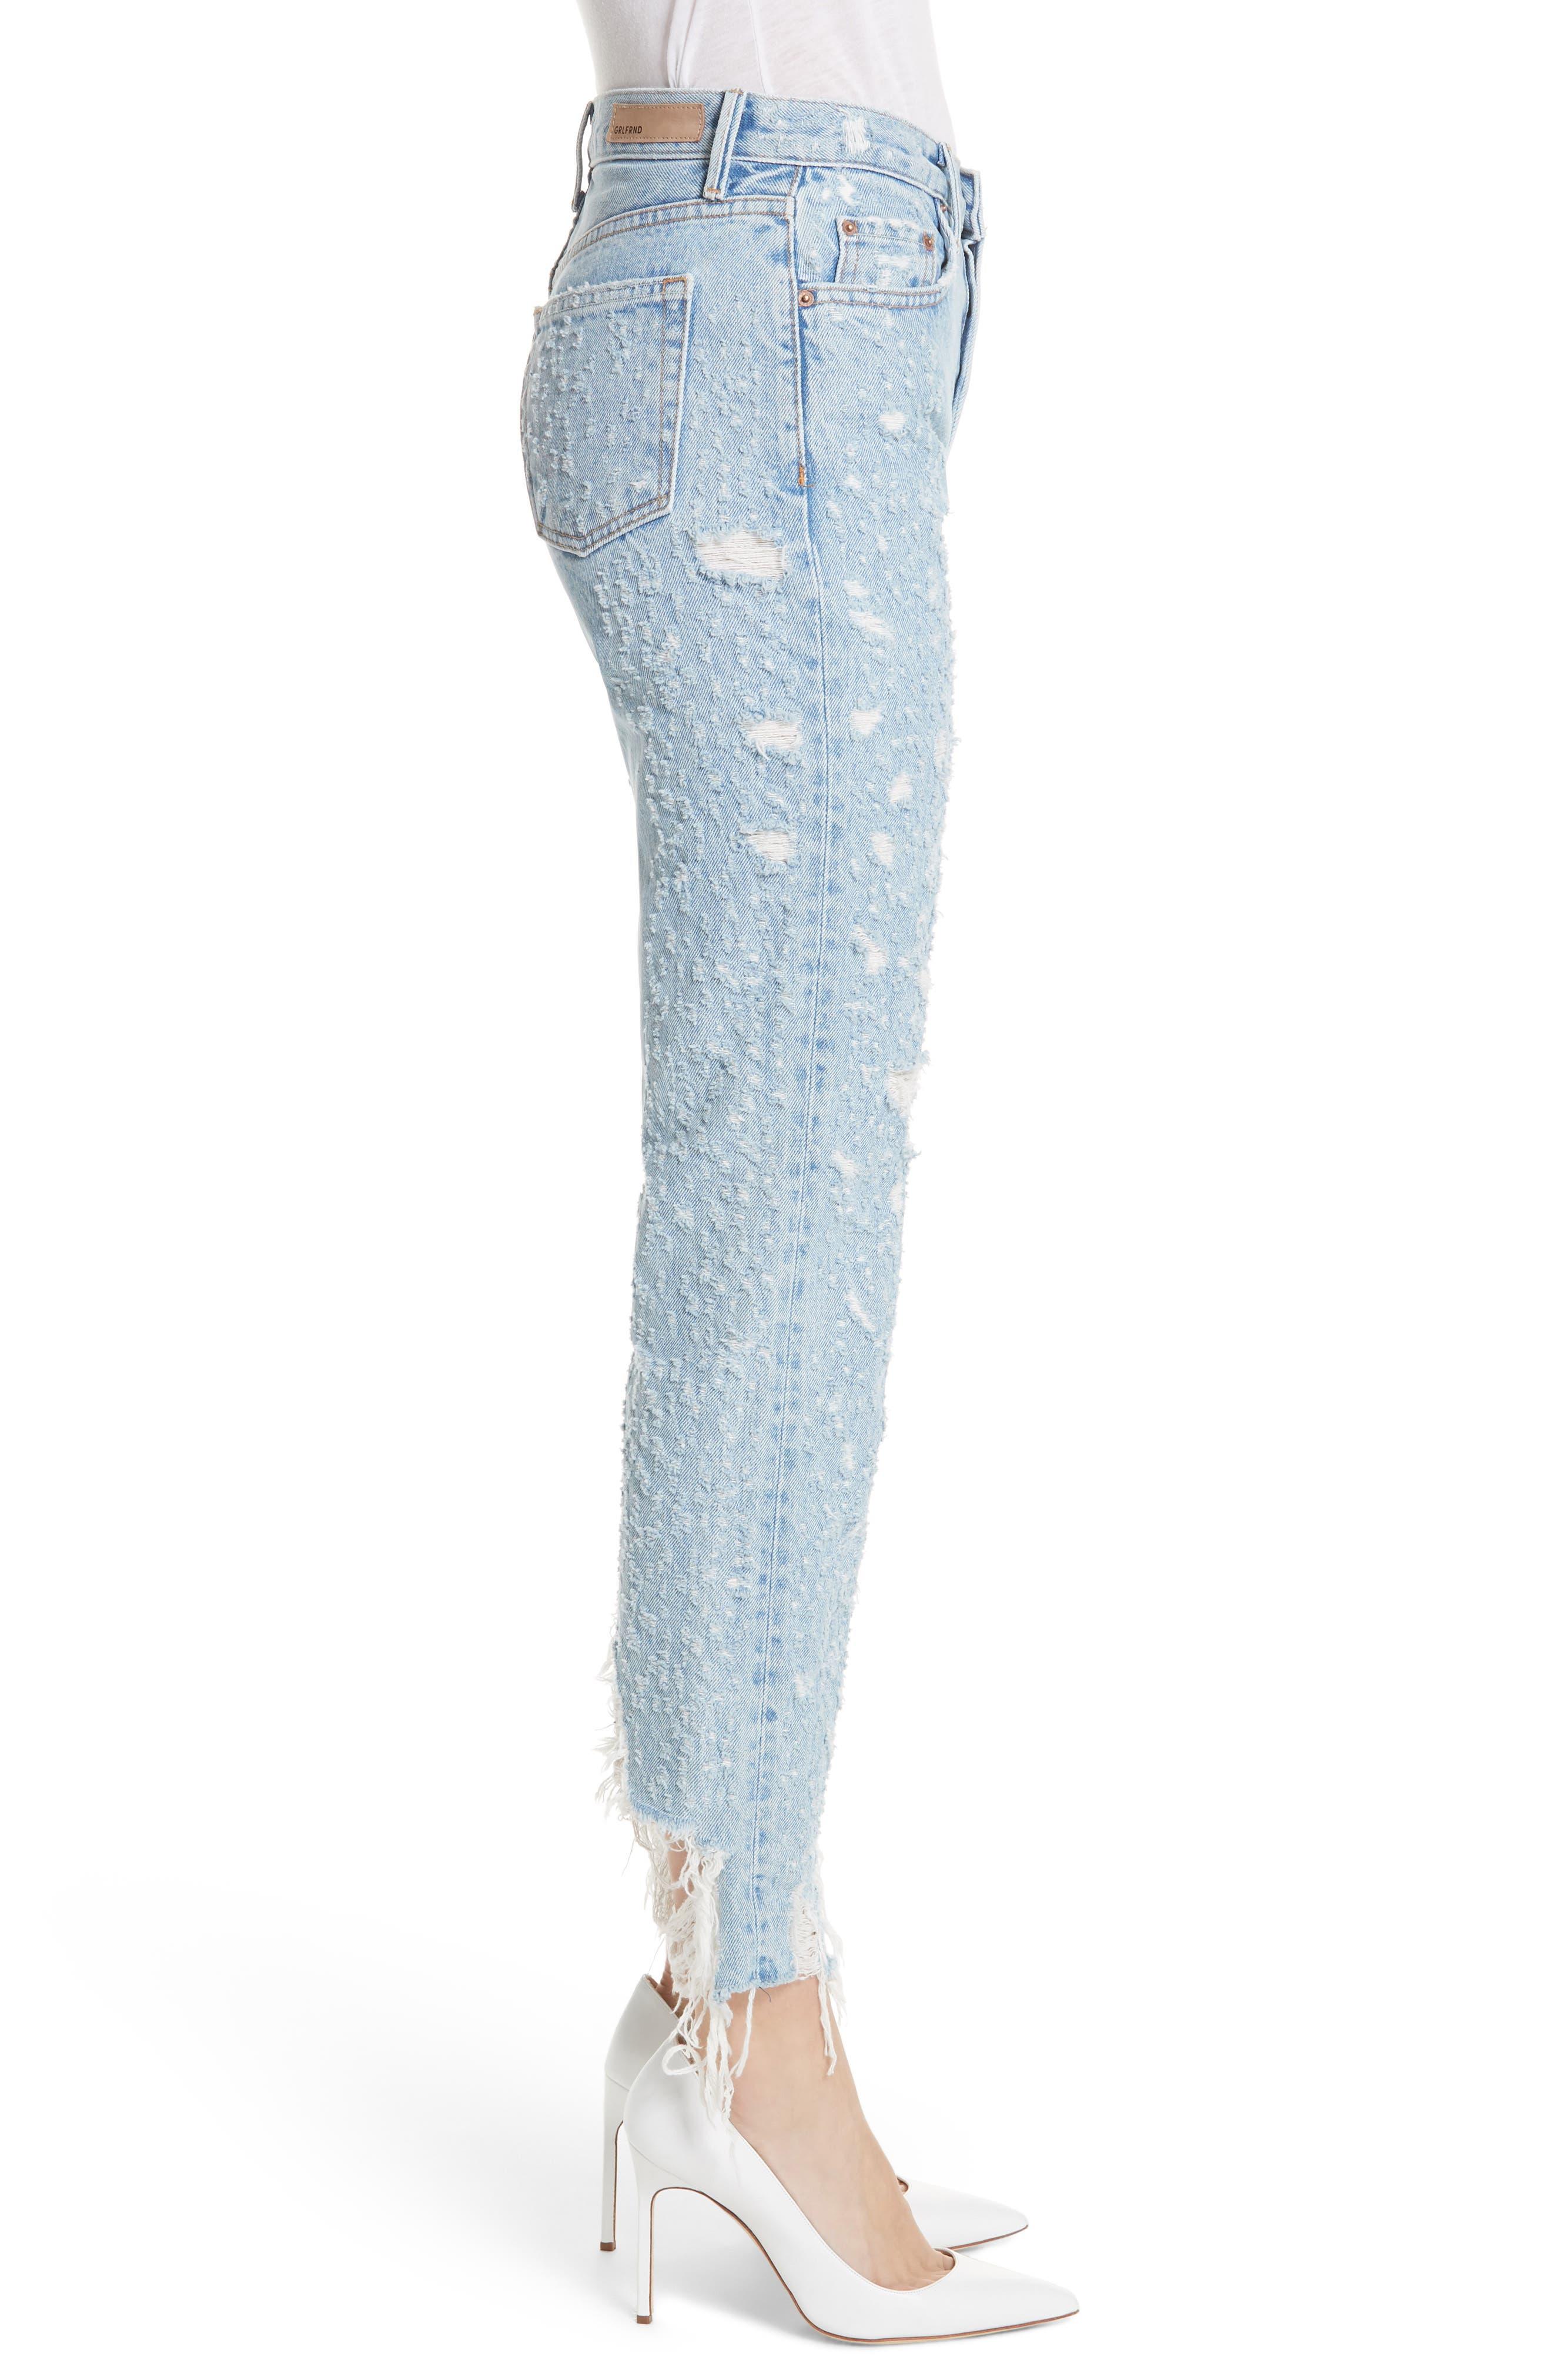 Helena Rigid High Waist Straight Jeans,                             Alternate thumbnail 3, color,                             BURN OUT